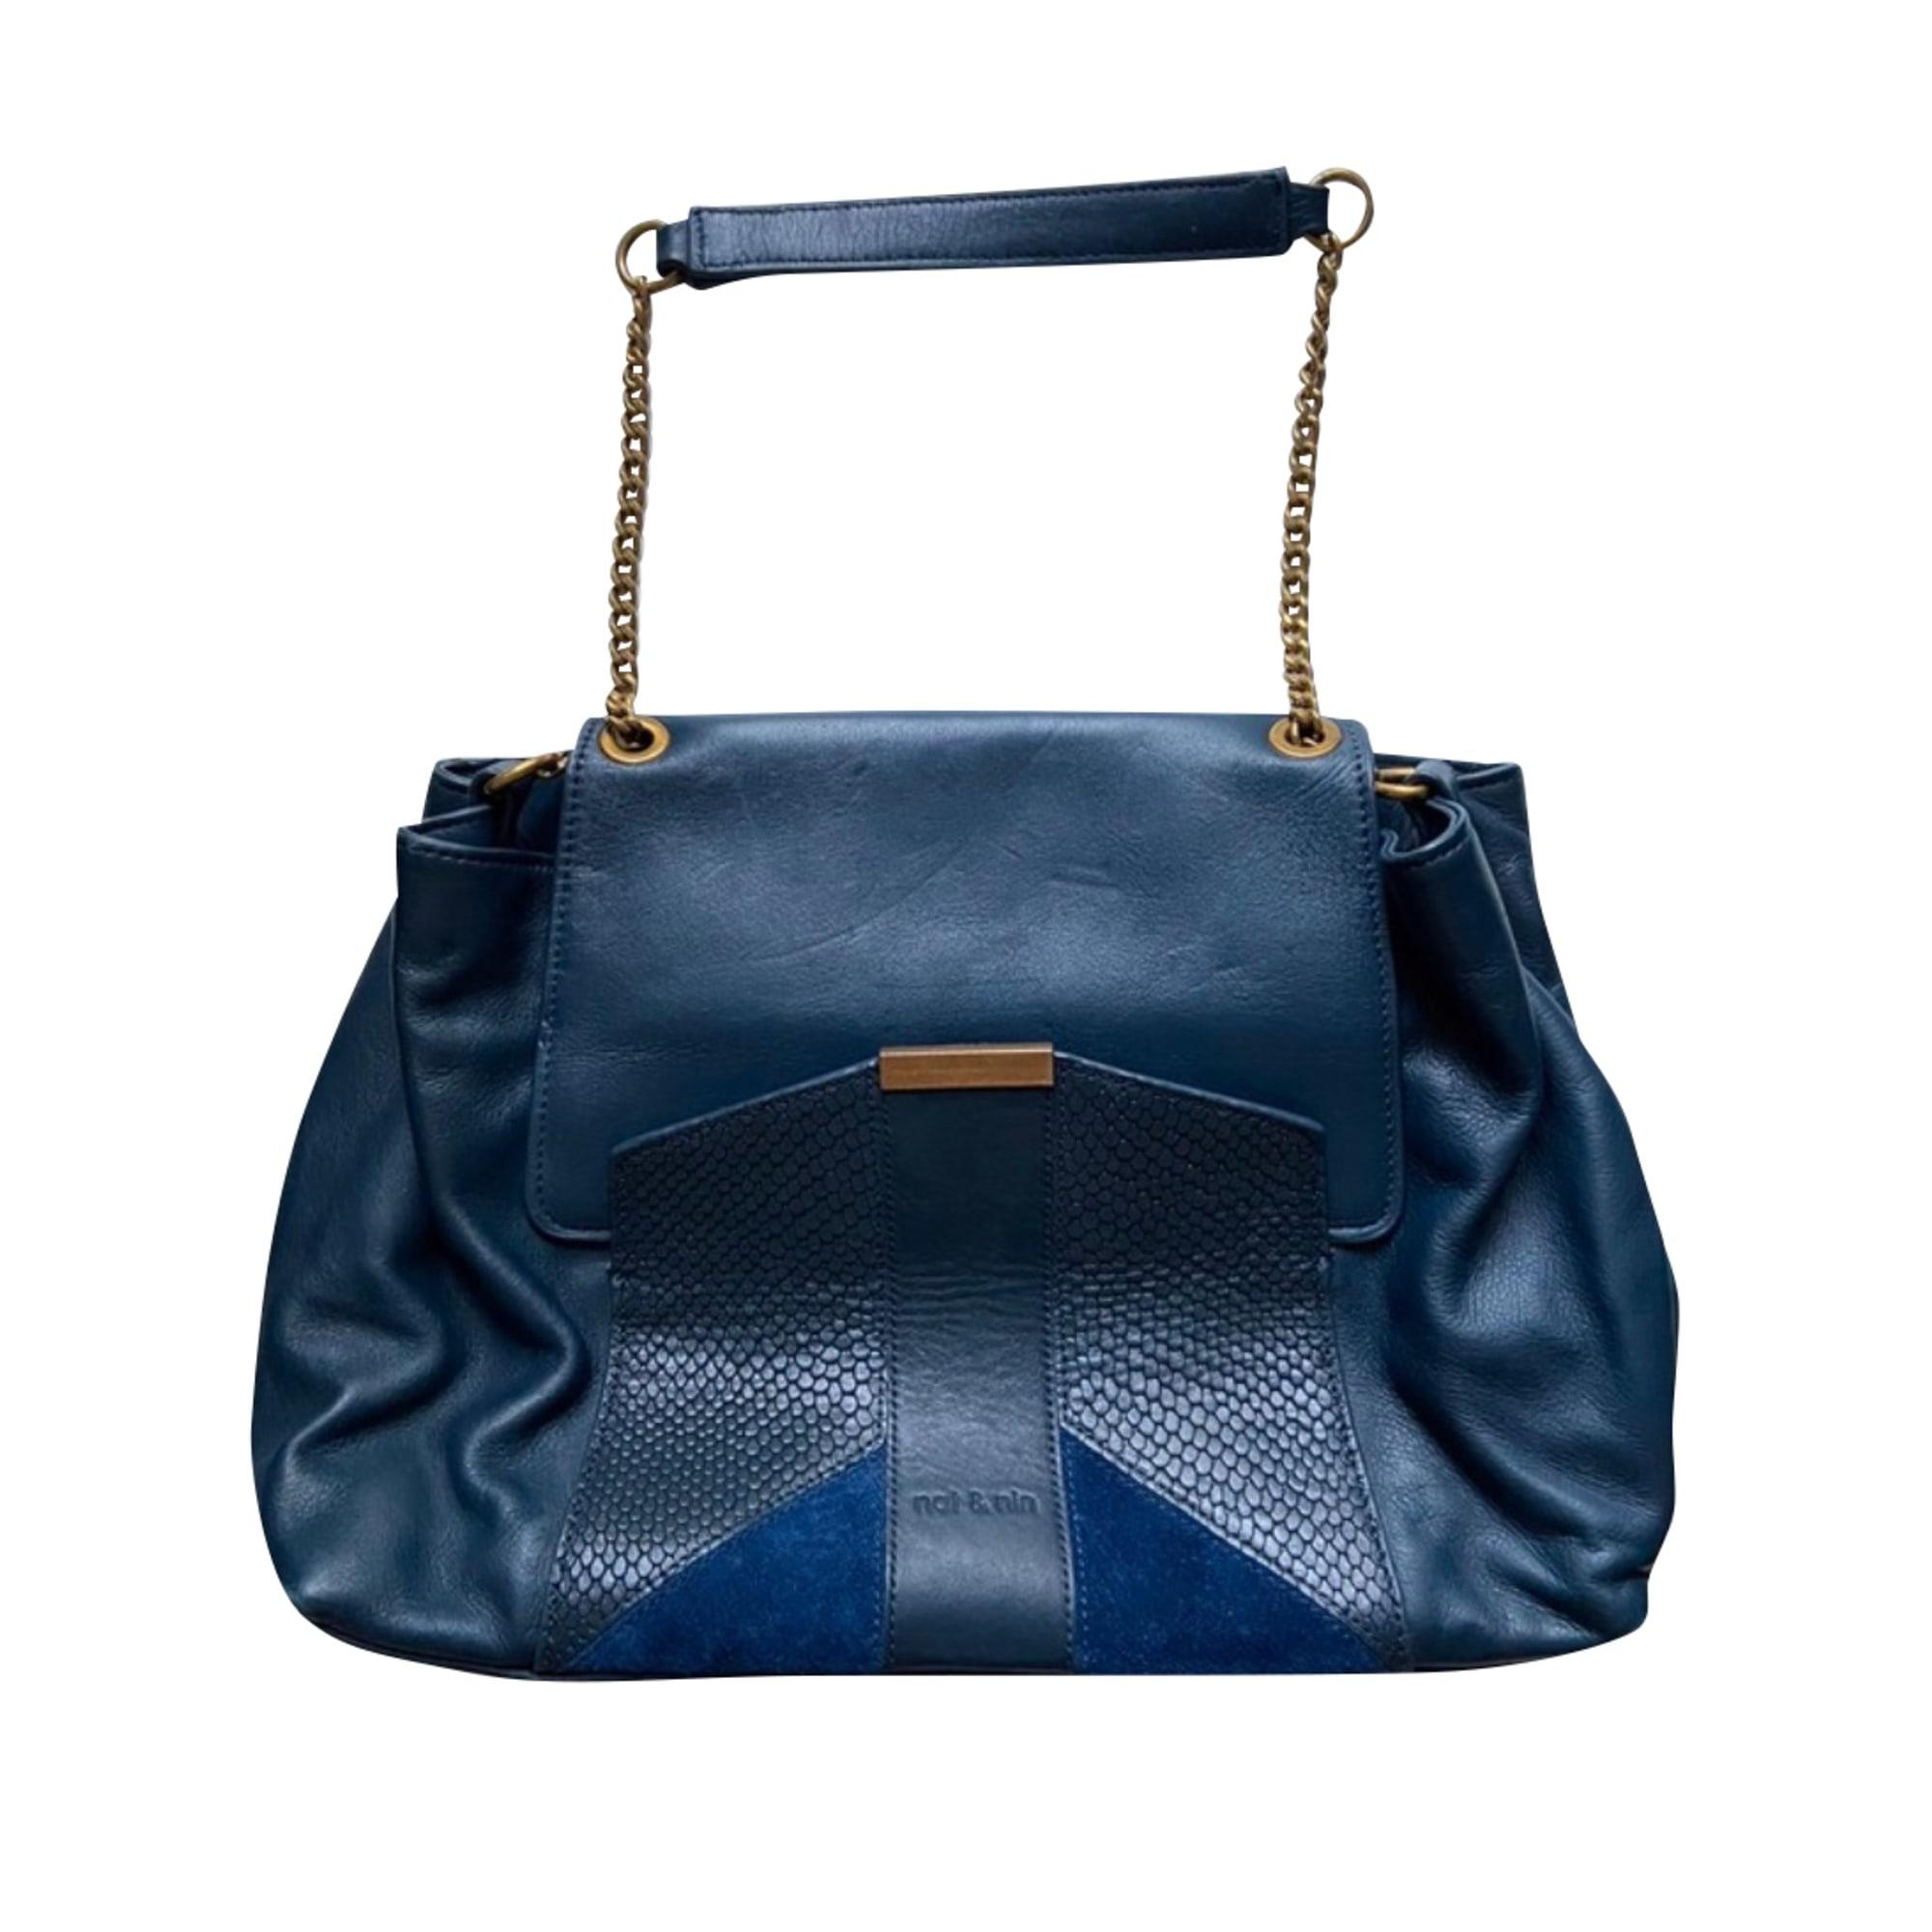 Lederhandtasche NAT & NIN Blau, marineblau, türkisblau